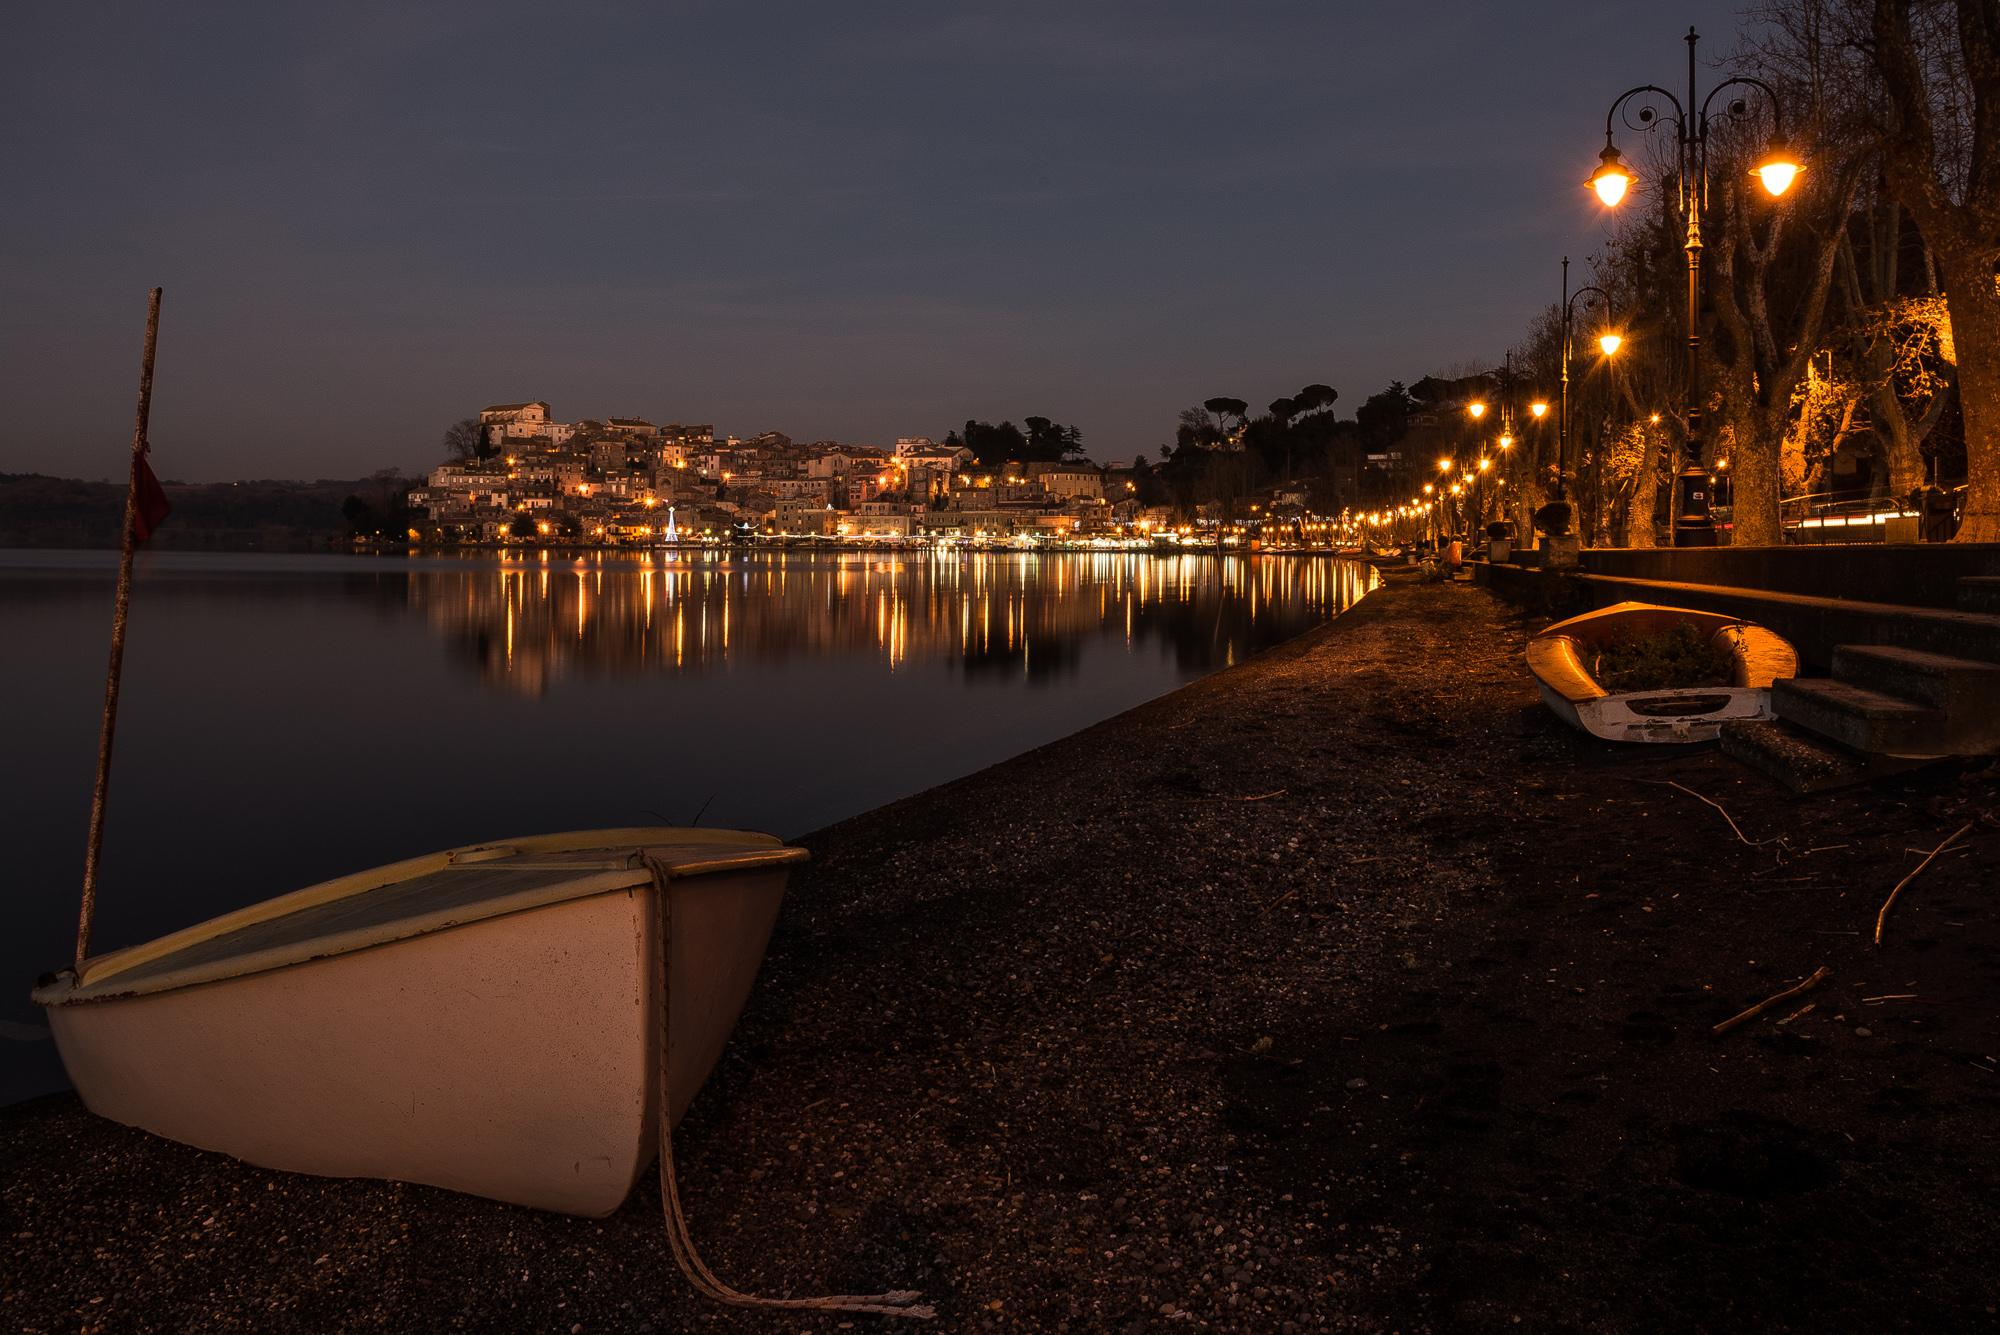 Angillara Sabazia in the night di servi_marco